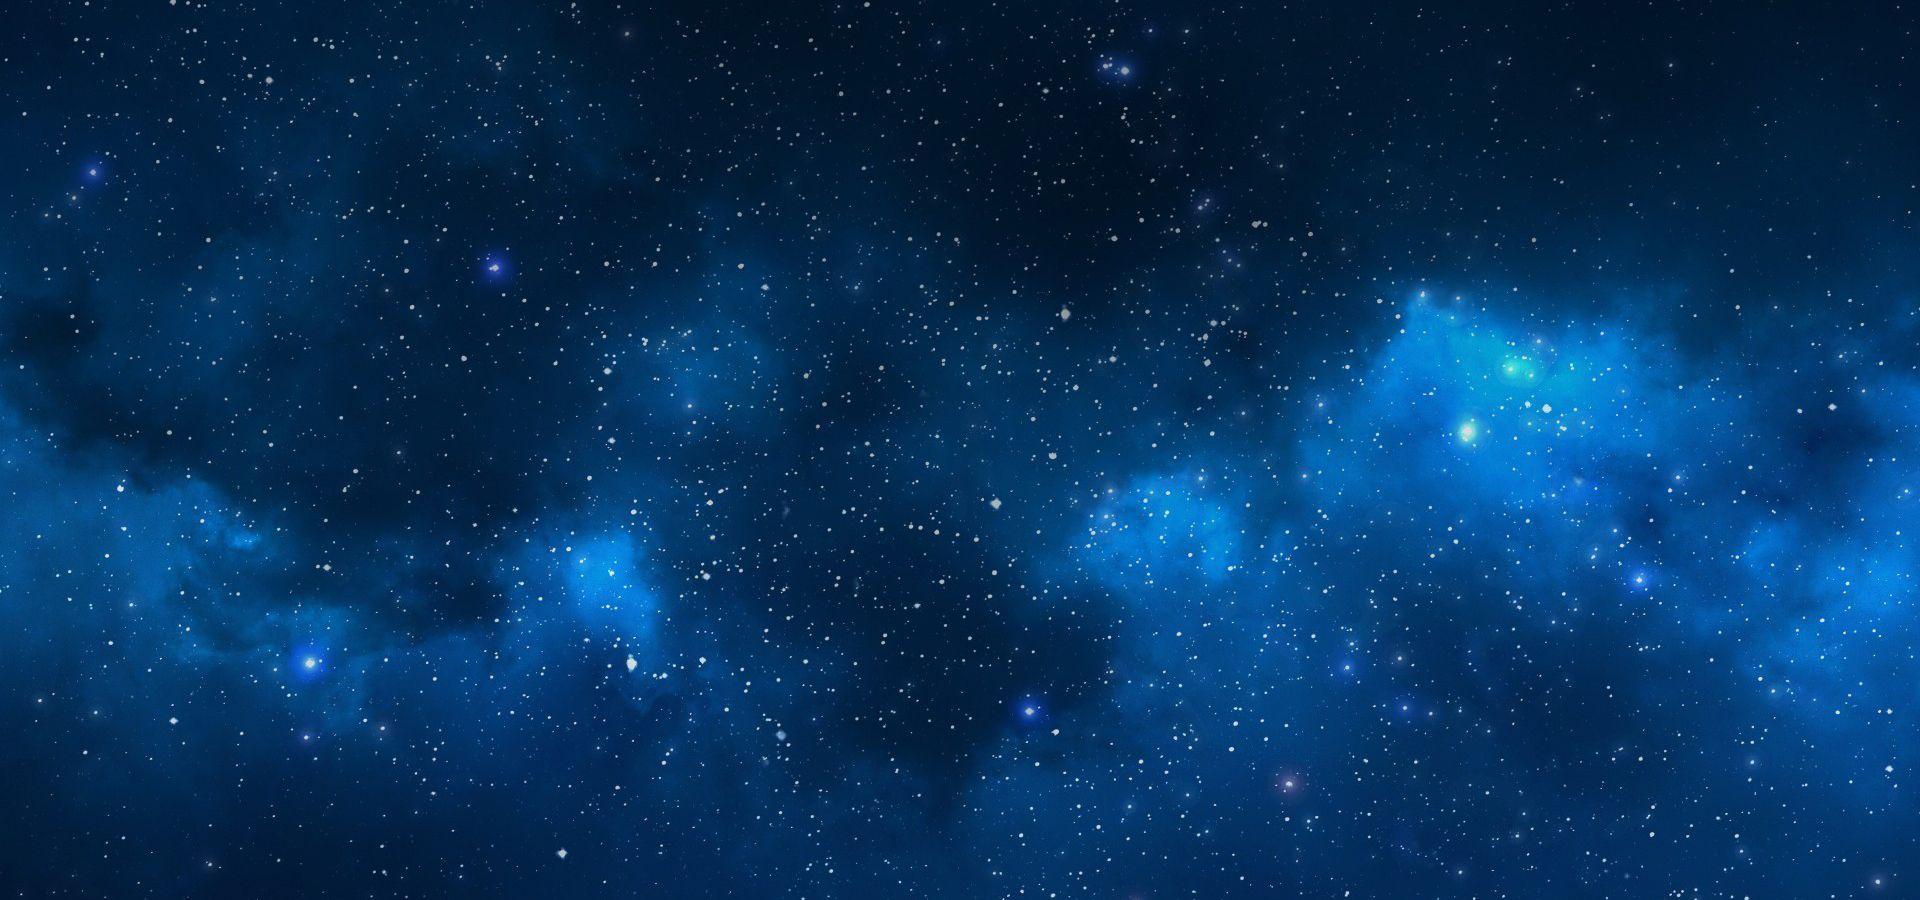 Night Sky Star Background Material Blue Night Sky Stars Star Background Stars At Night